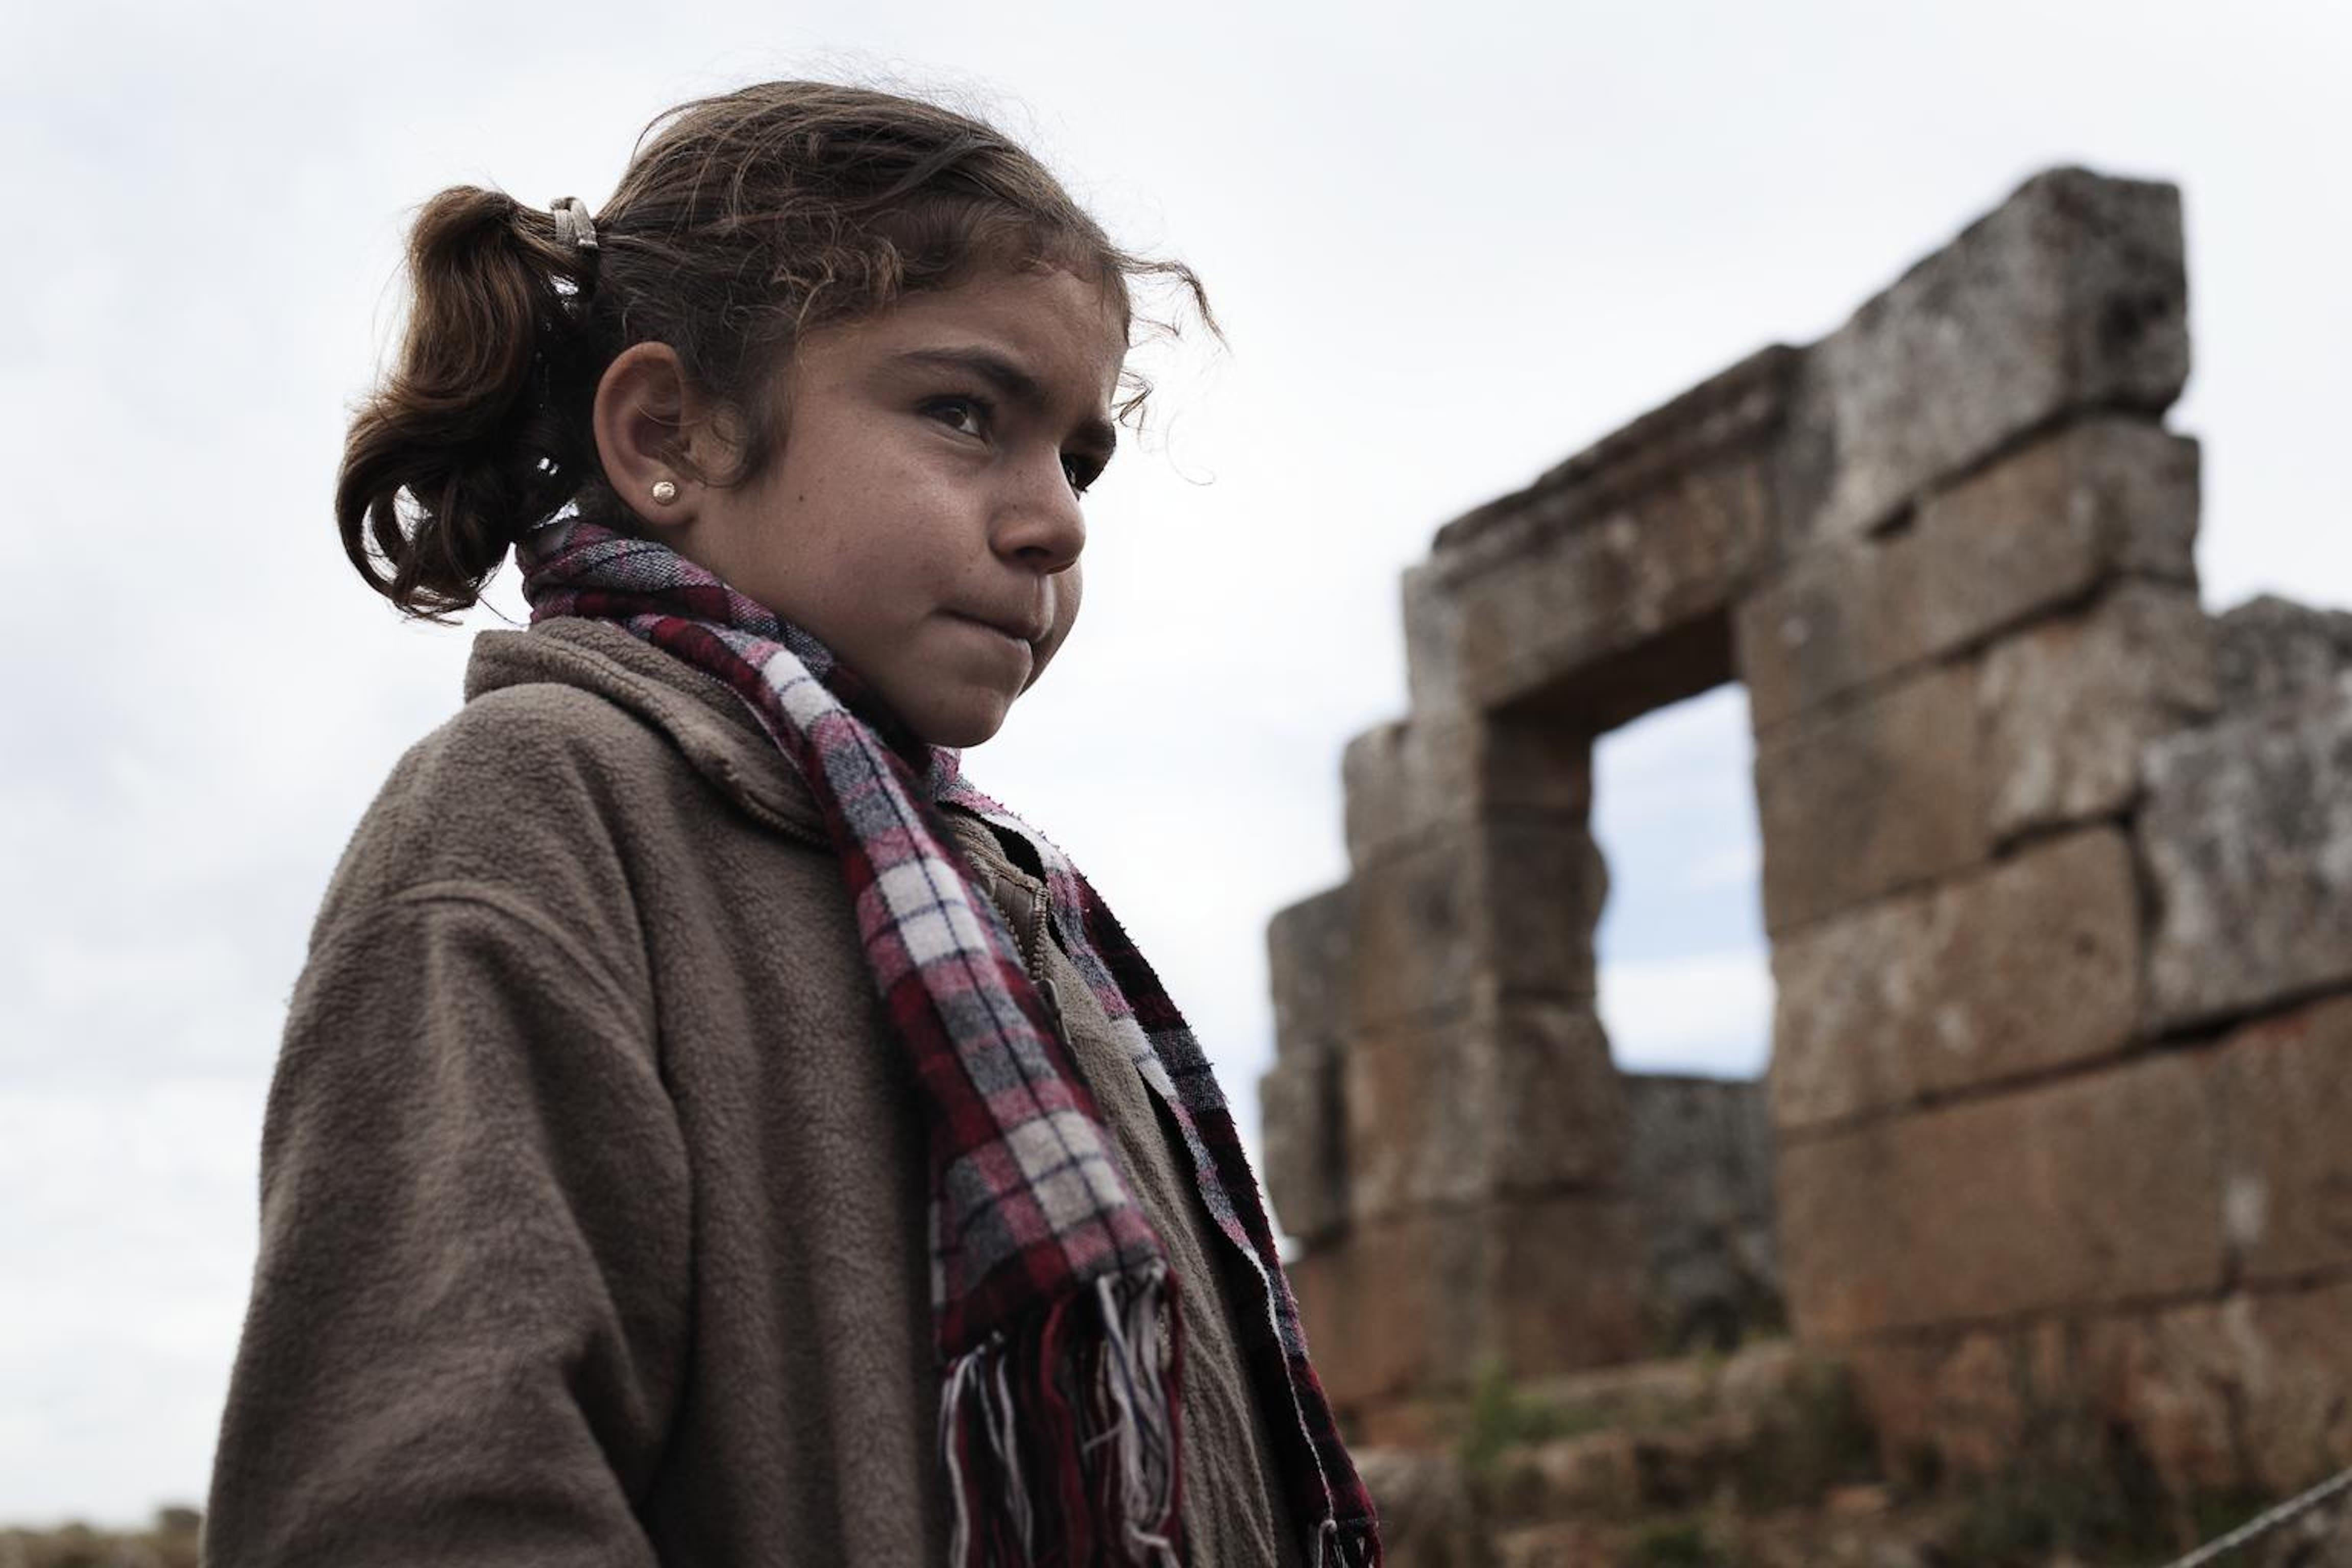 Una bambina rifugiata siriana. © UNICEF/NYHQ2013-0315/Greco